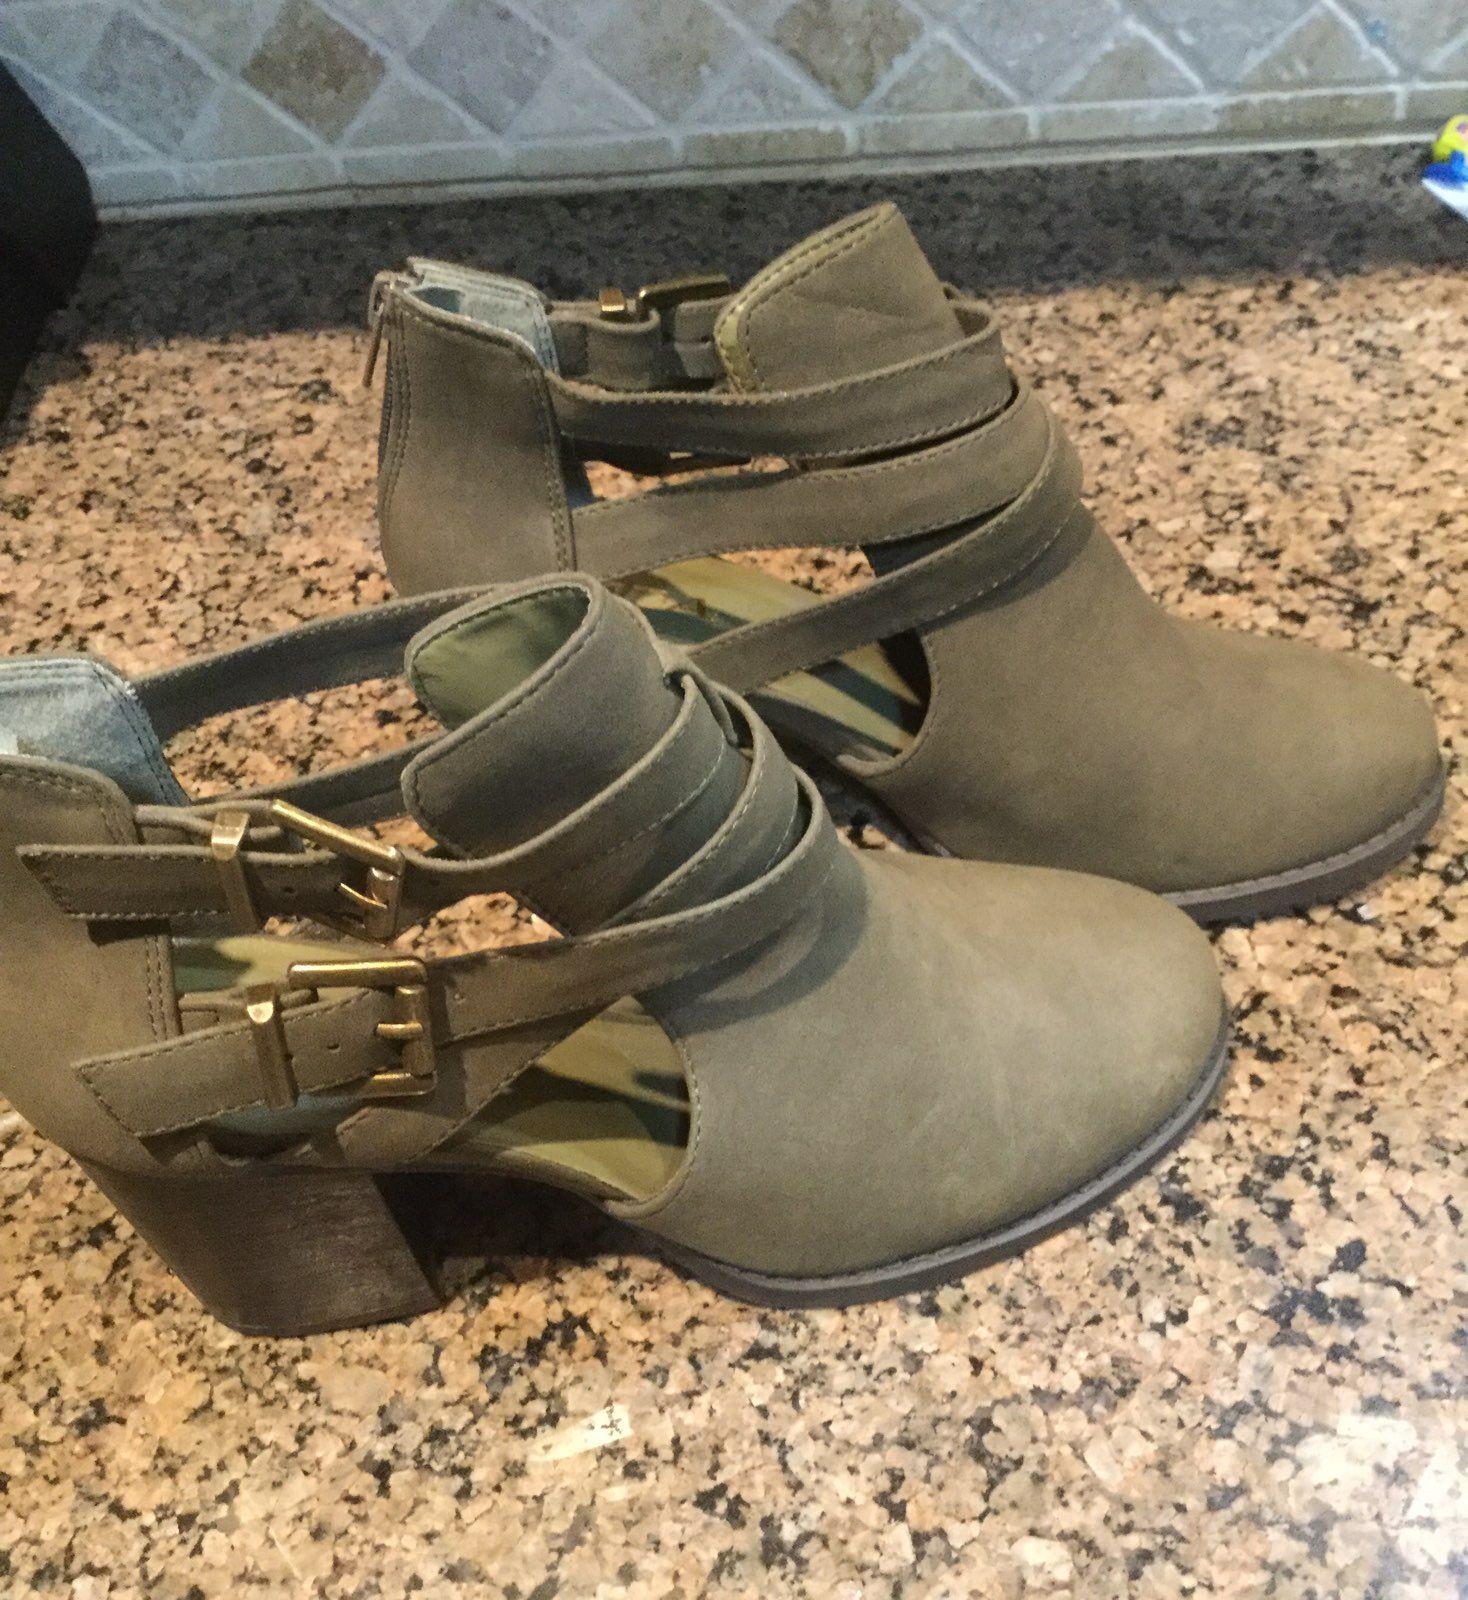 Bootie Boots